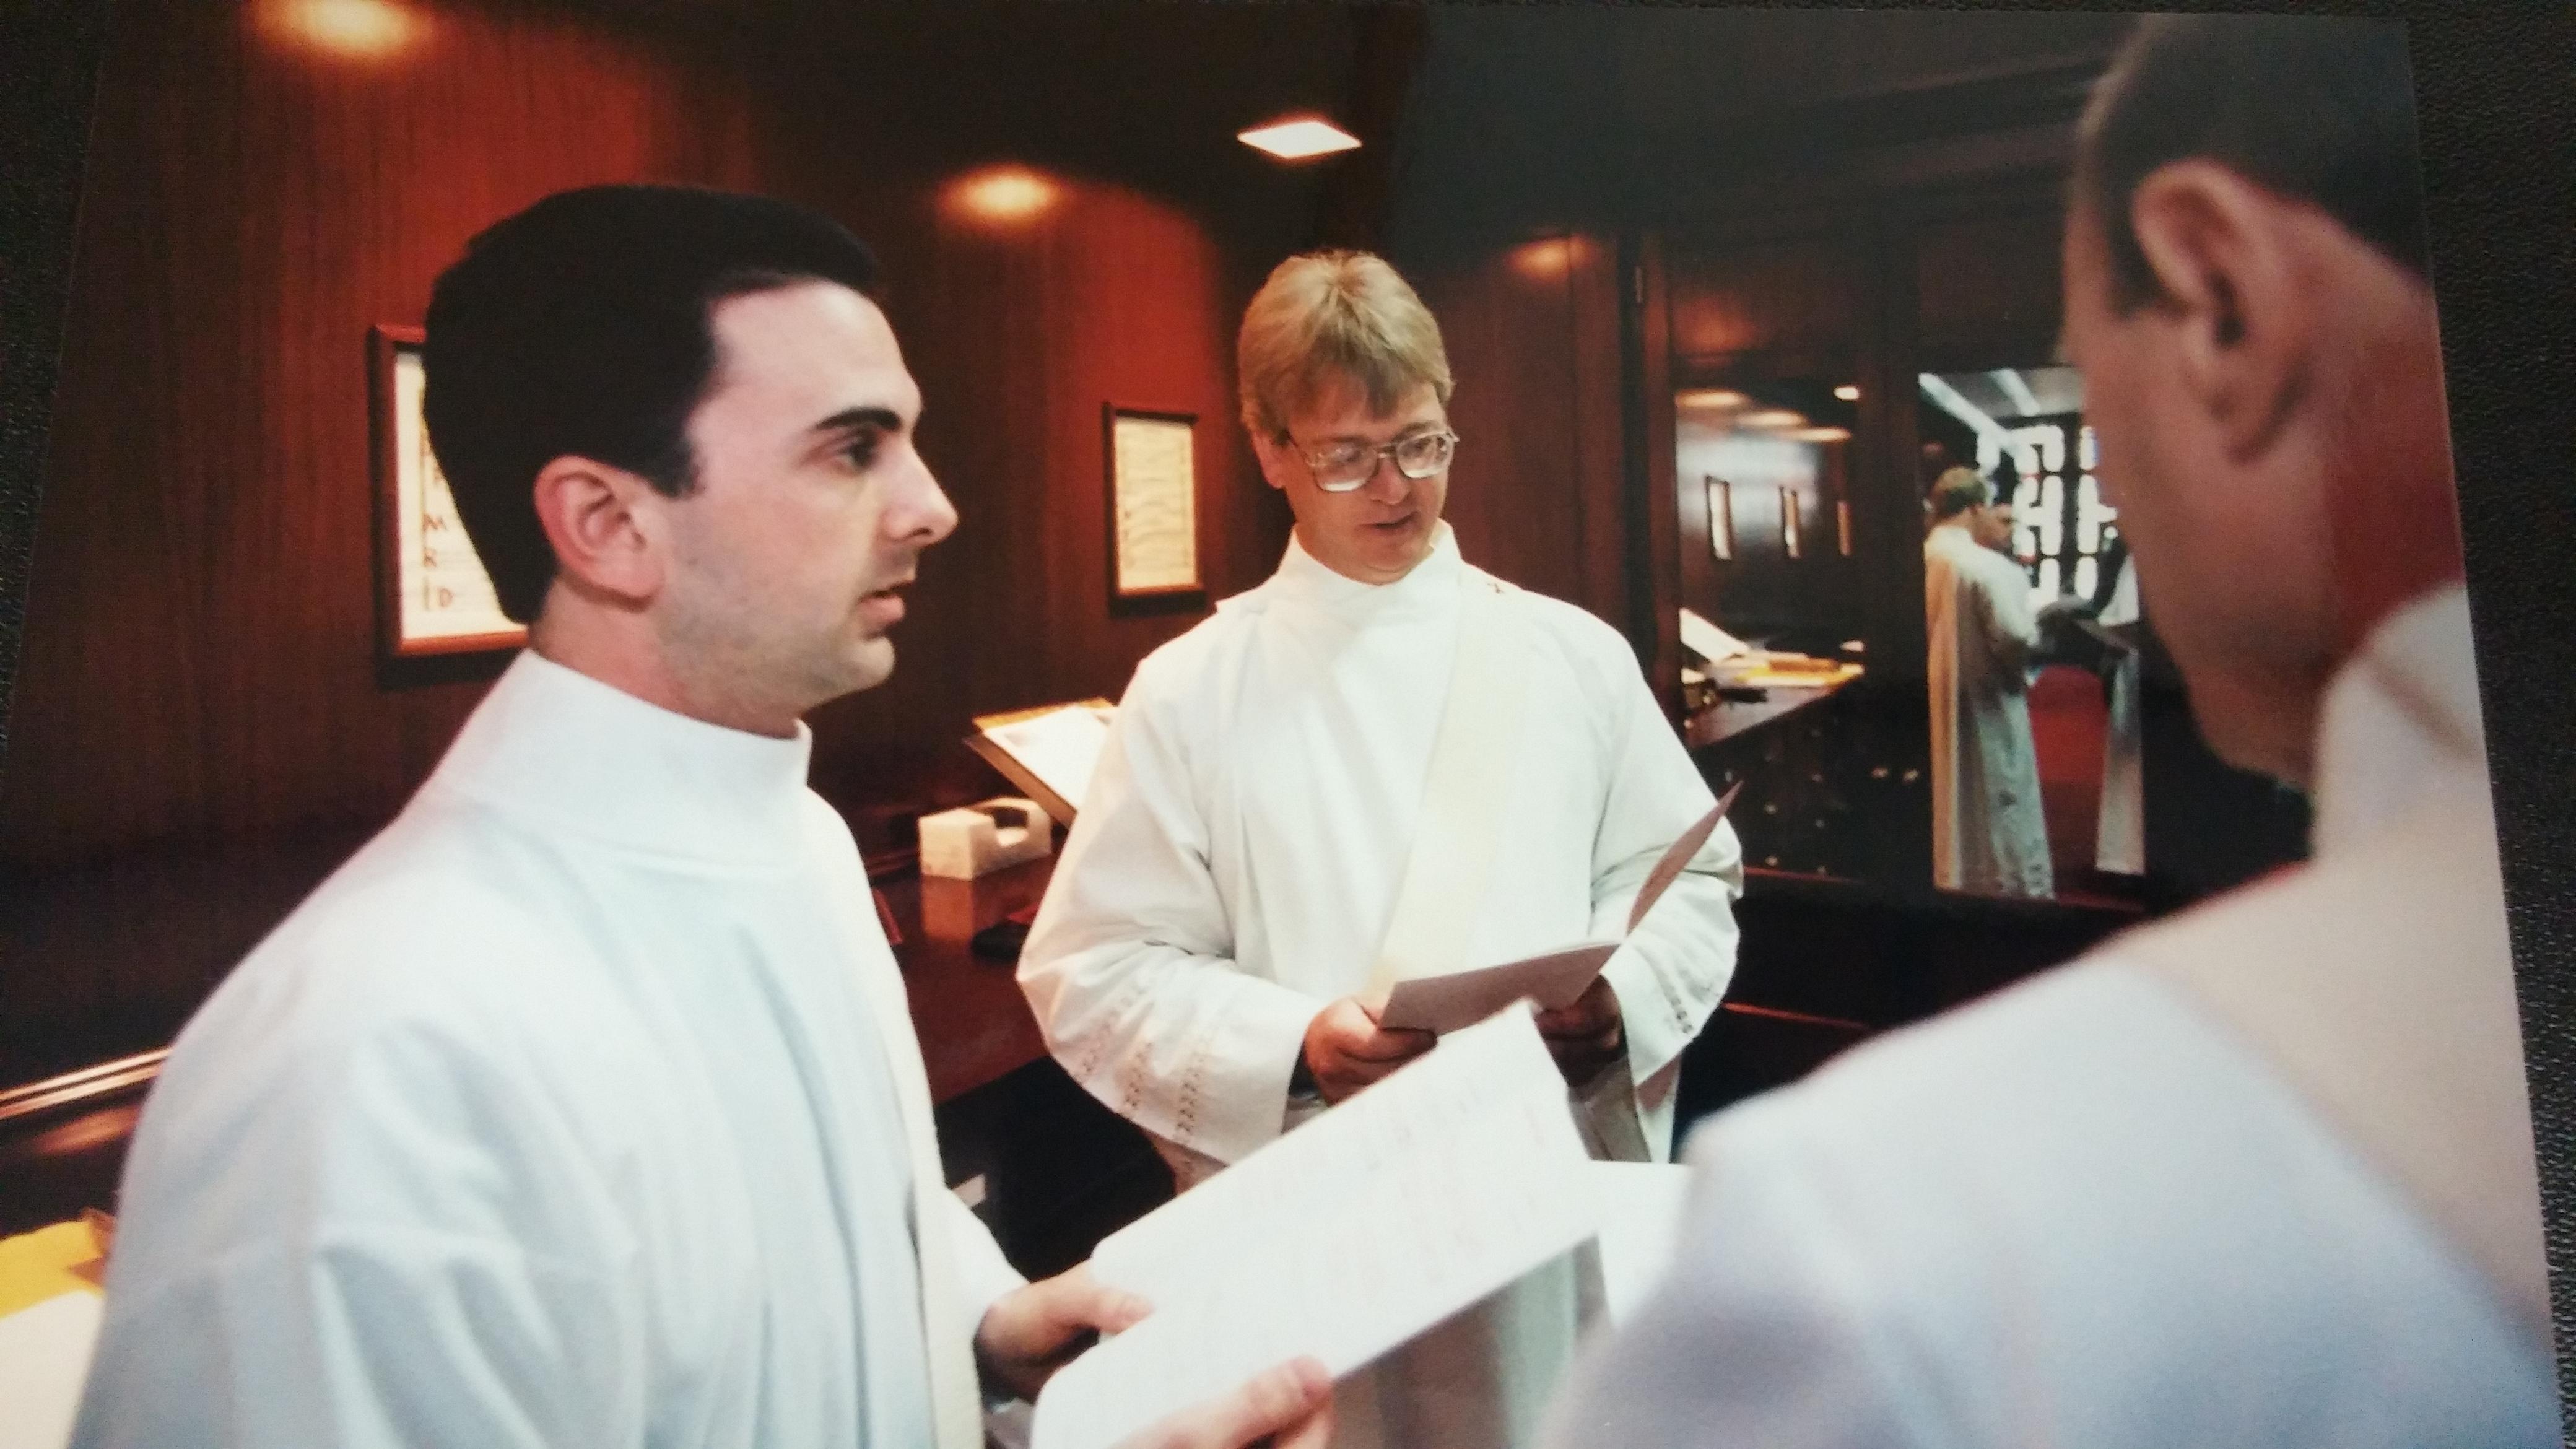 Deacons Piepmeyer, Fullmer, and Meyer prepare for Ordination